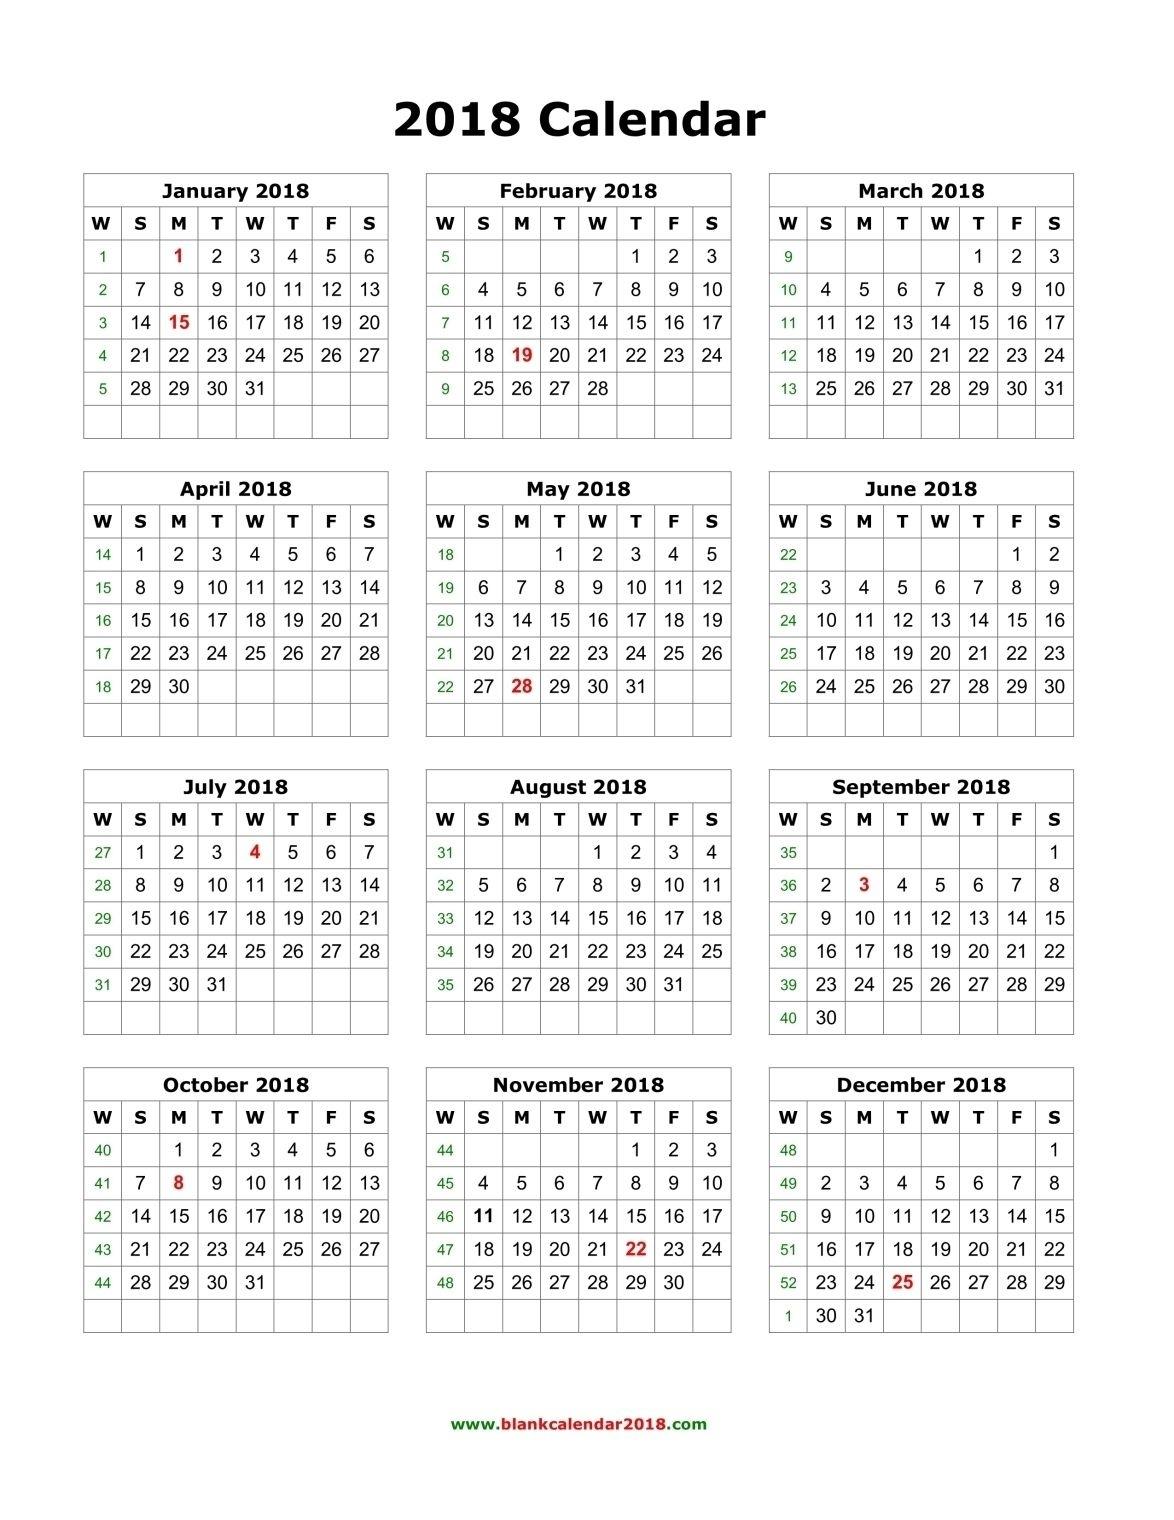 Annual Calendar 2019 Portrait Printable Calendar 2017 2018 2019 By_4 Week Calendar Blank